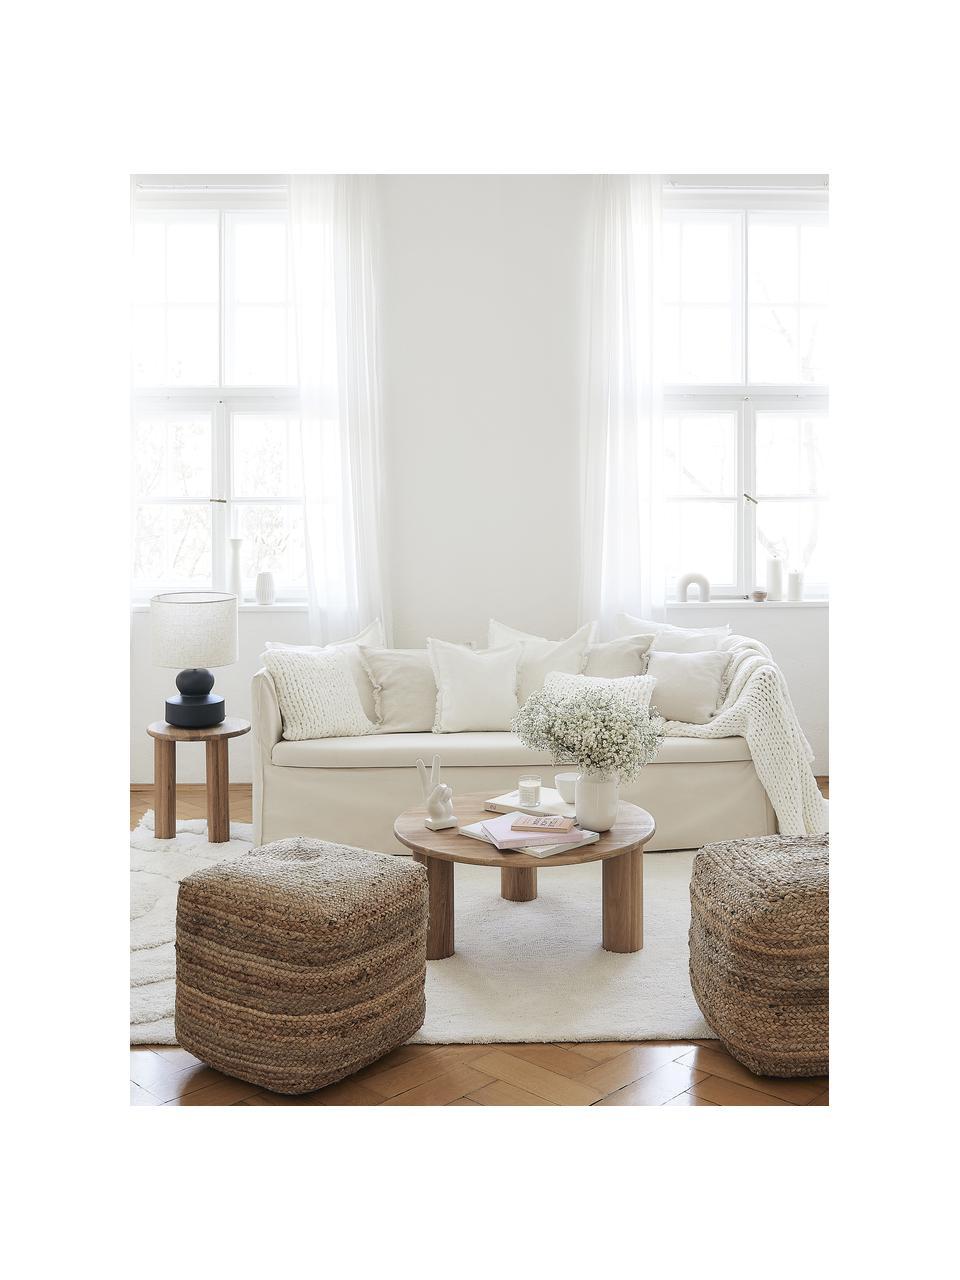 Linnen kussenhoes Luana in lichtbeige met franjes, 100% linnen, Beige, 50 x 50 cm